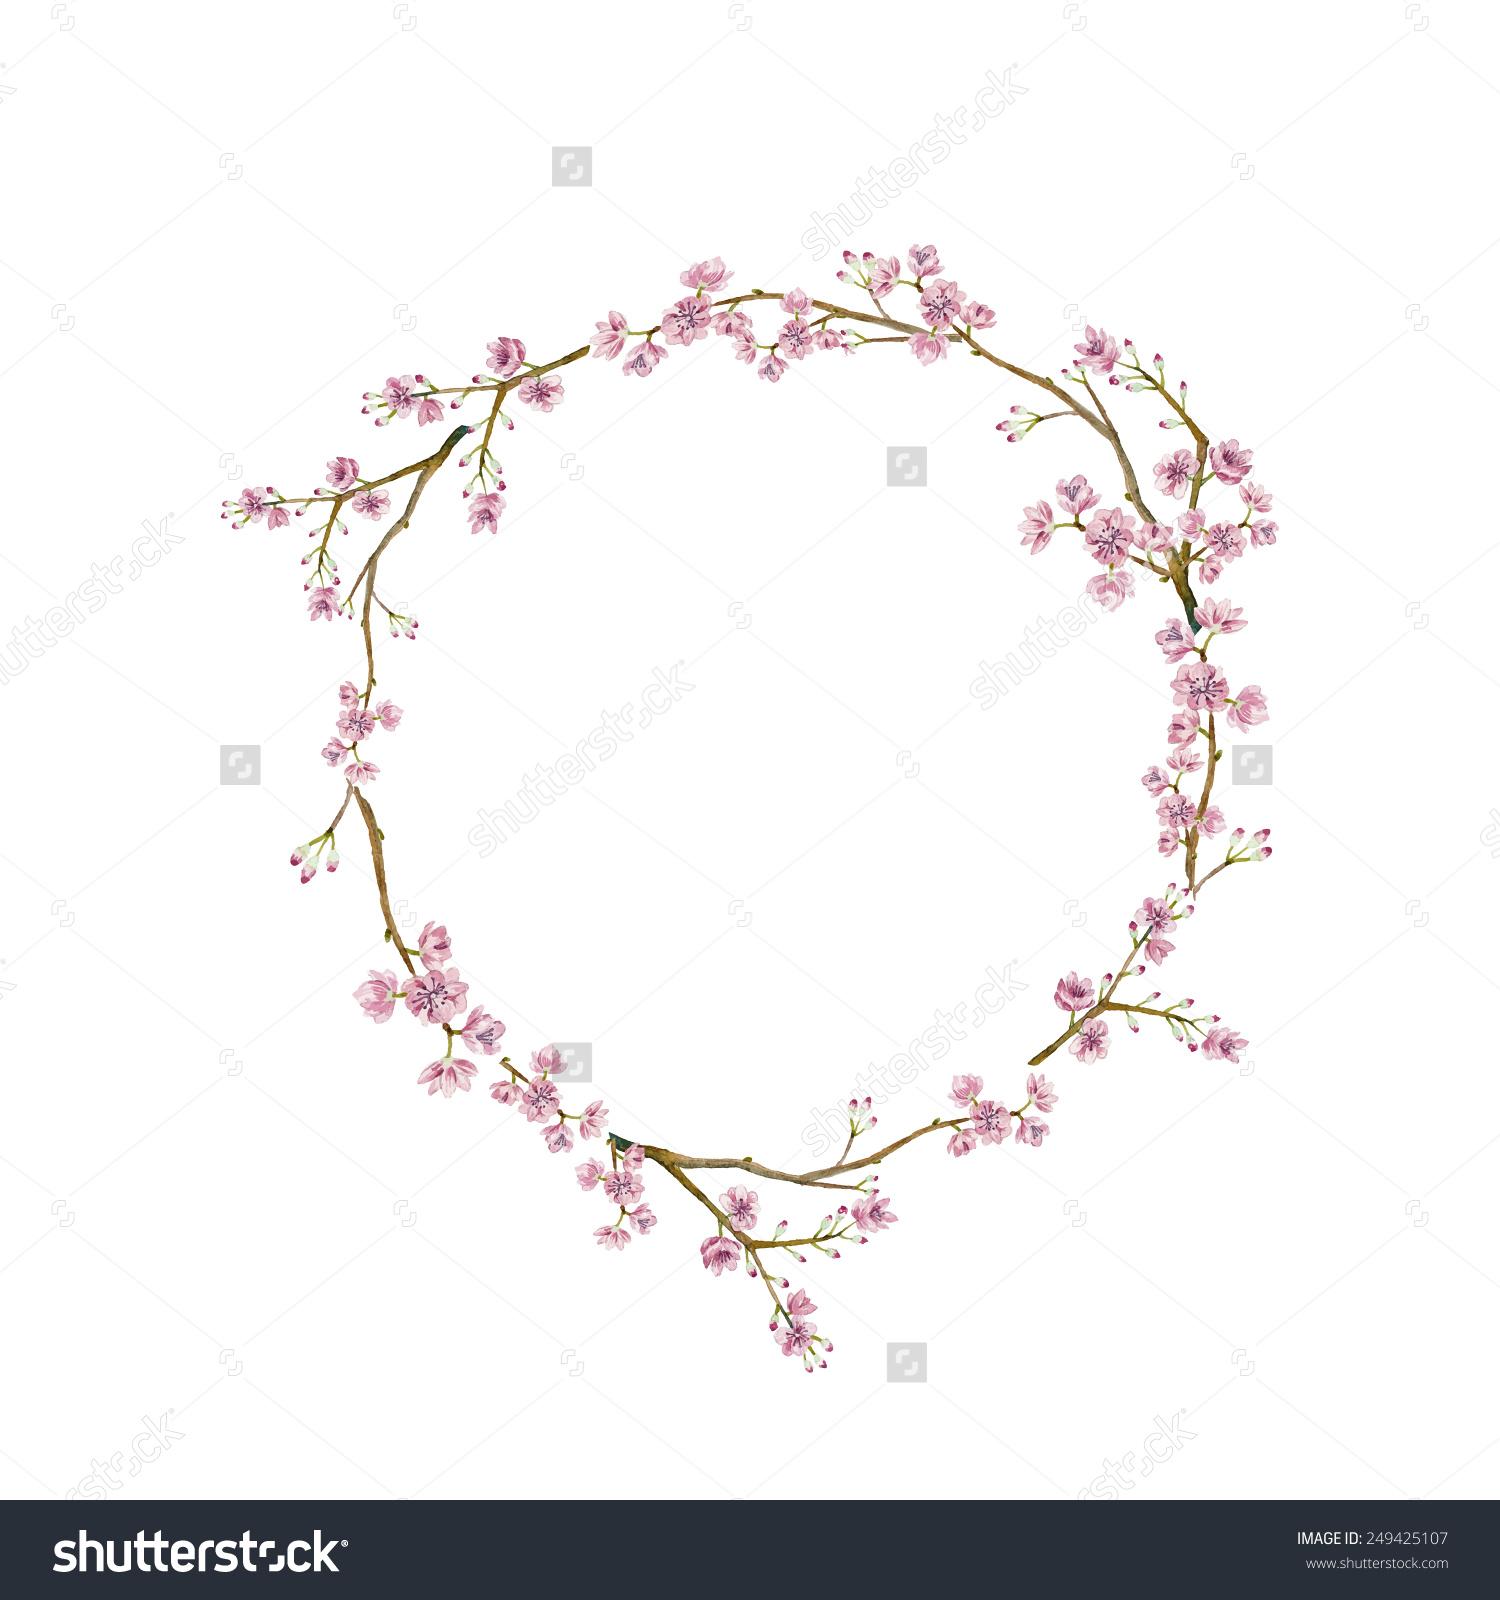 Drawn sakura blossom chery Watercolor sakura vector stock natural